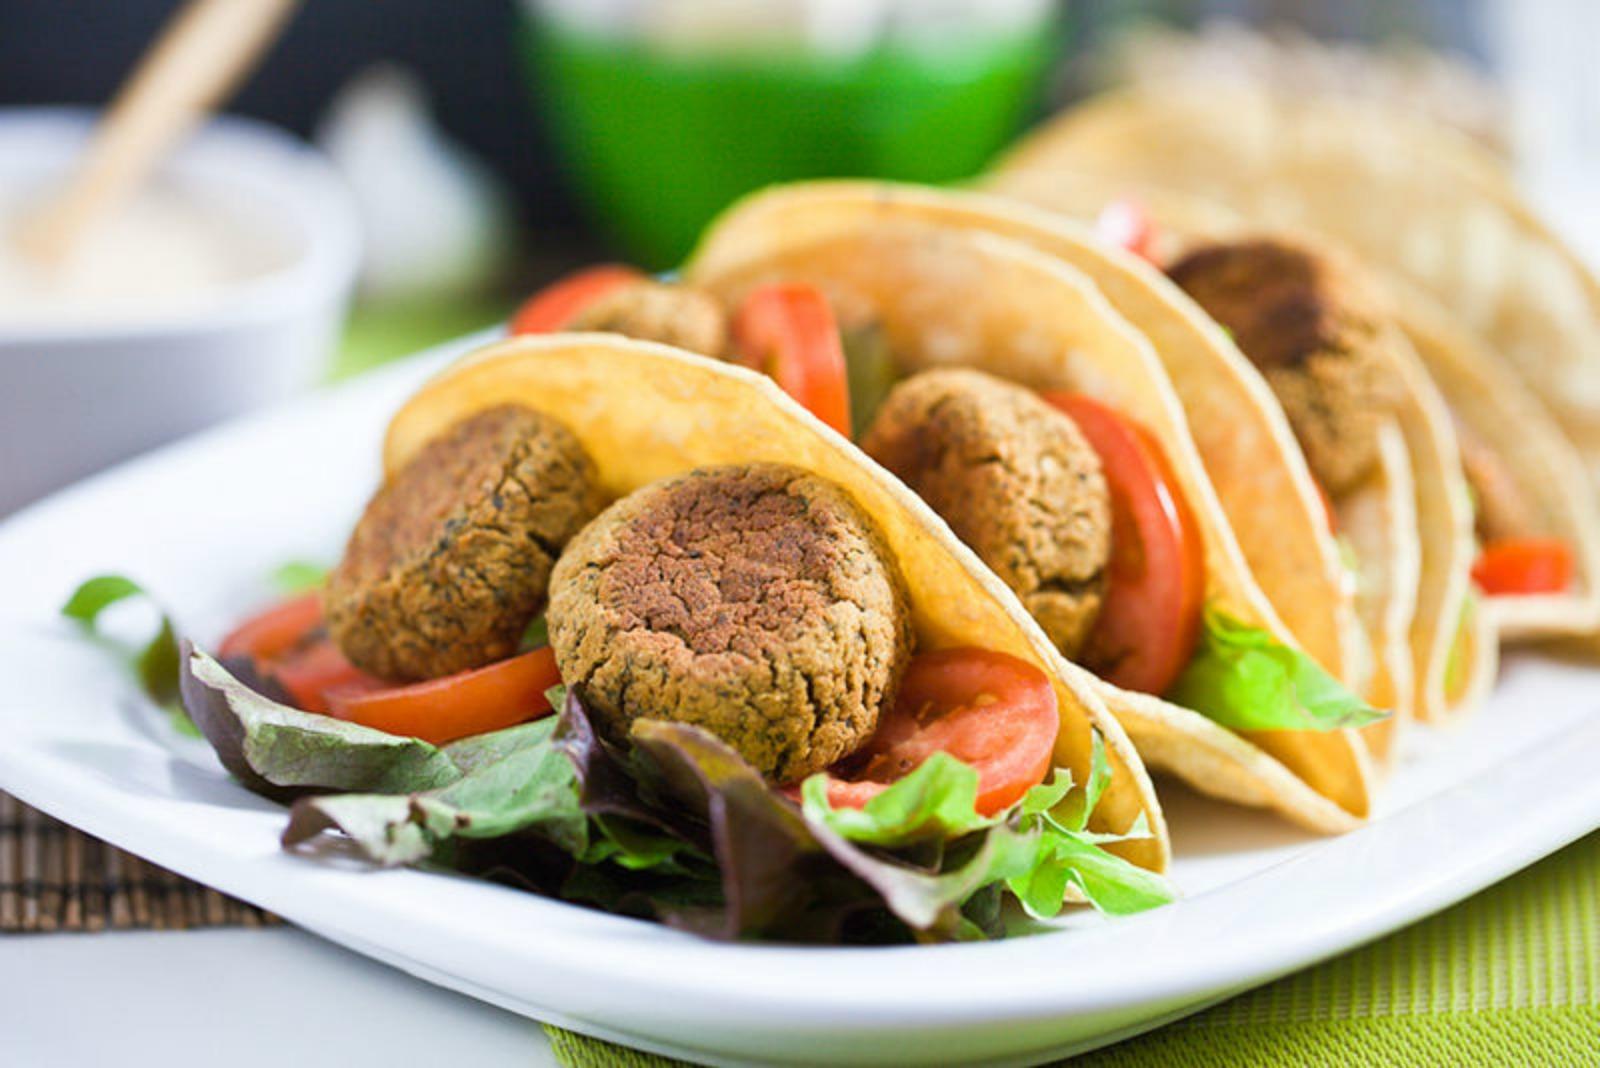 Vegan A Week's Worth of Delicious Vegan Tacos!